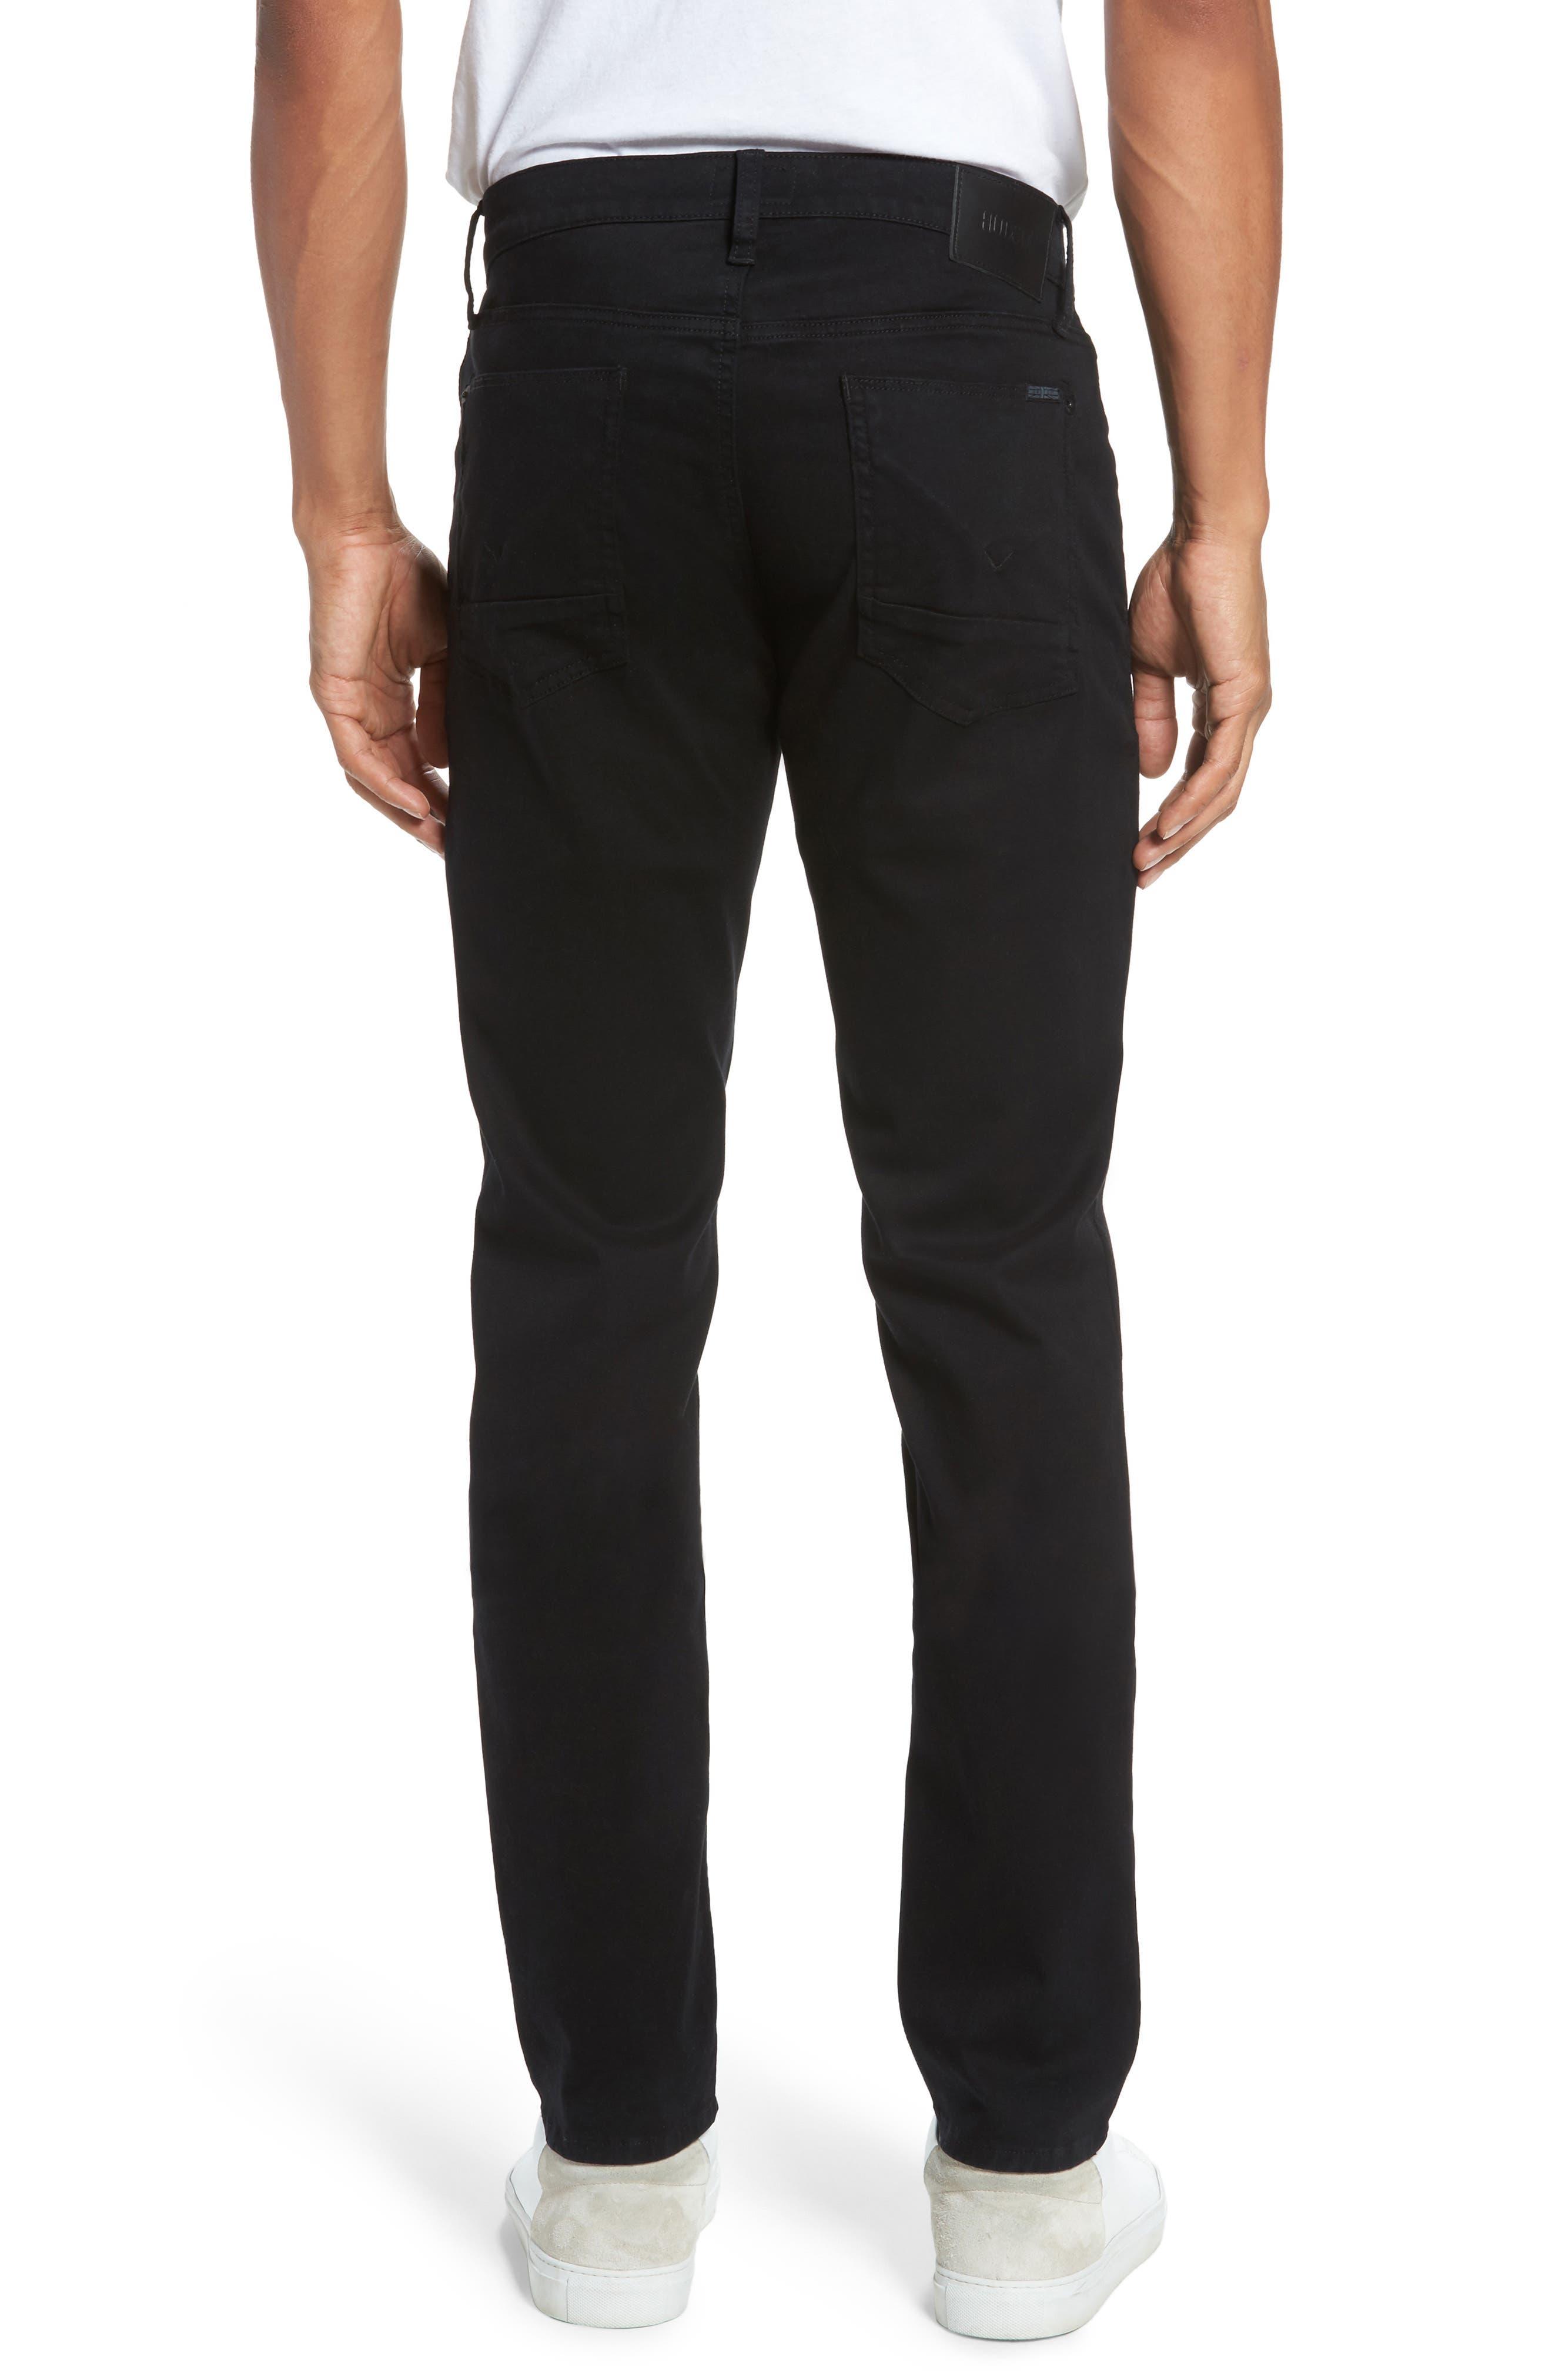 Blake Slim Fit Jeans,                             Alternate thumbnail 2, color,                             Blackened